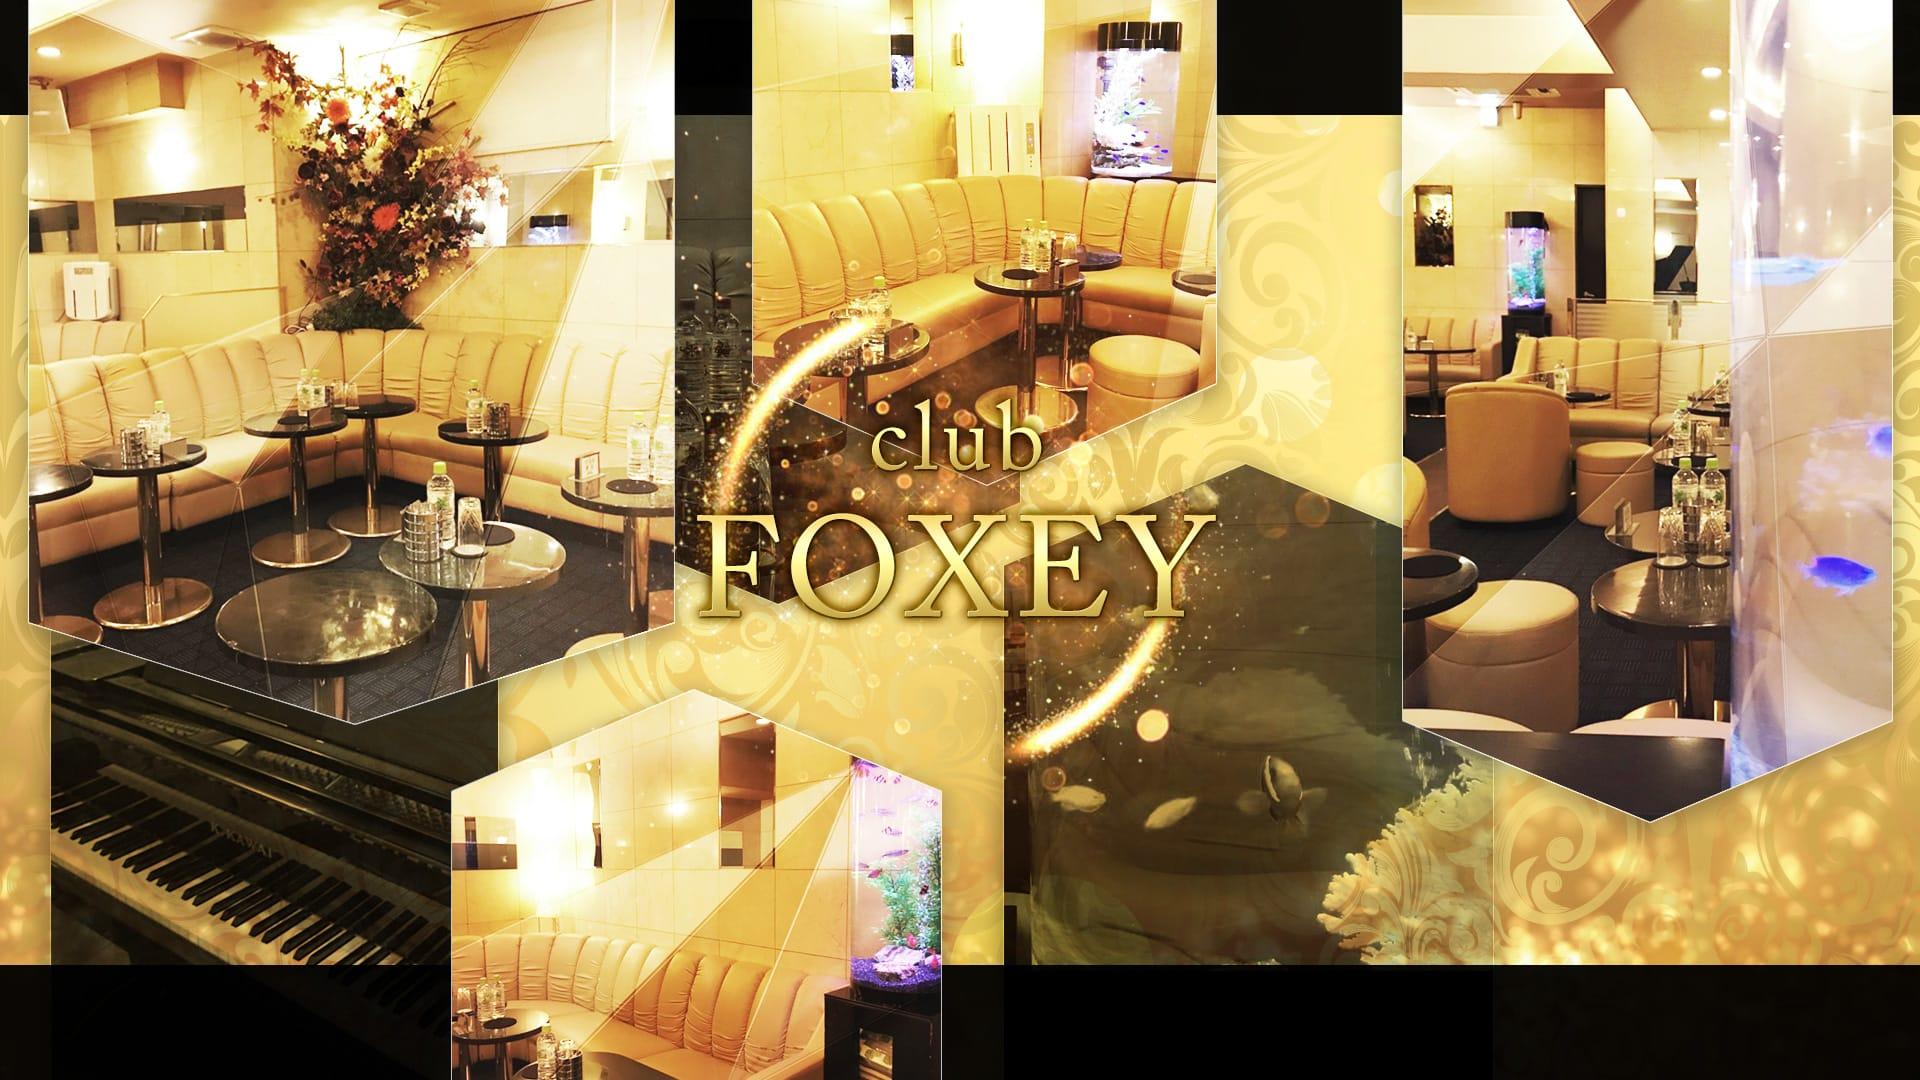 FOXEY(フォクシー) 川崎キャバクラ TOP画像